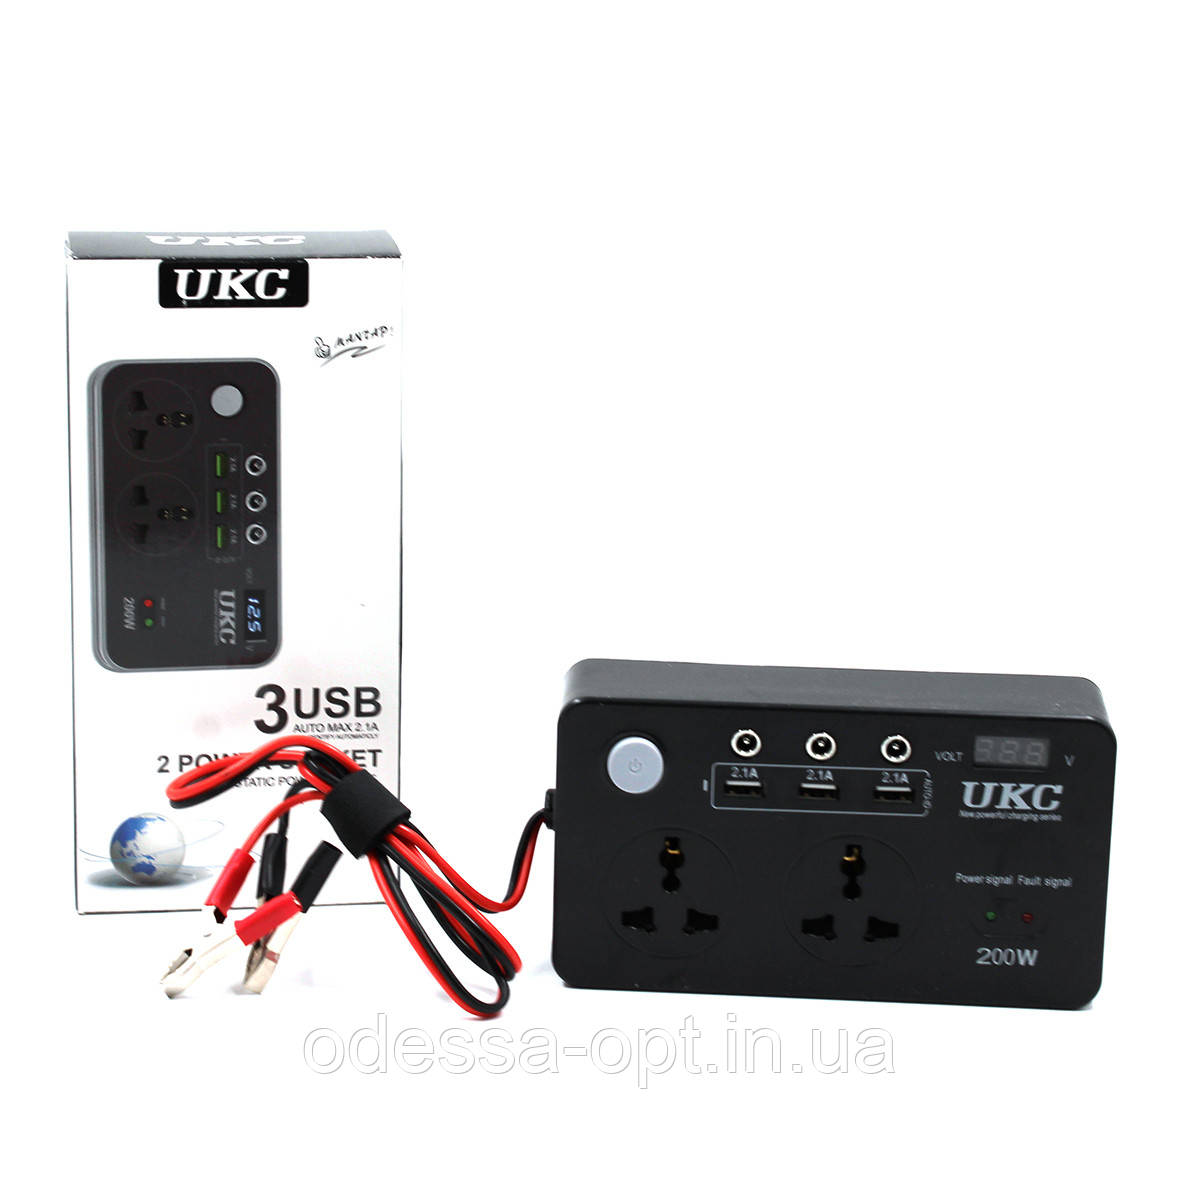 Преобразователь AC/DC 200W 12V LCD / USB